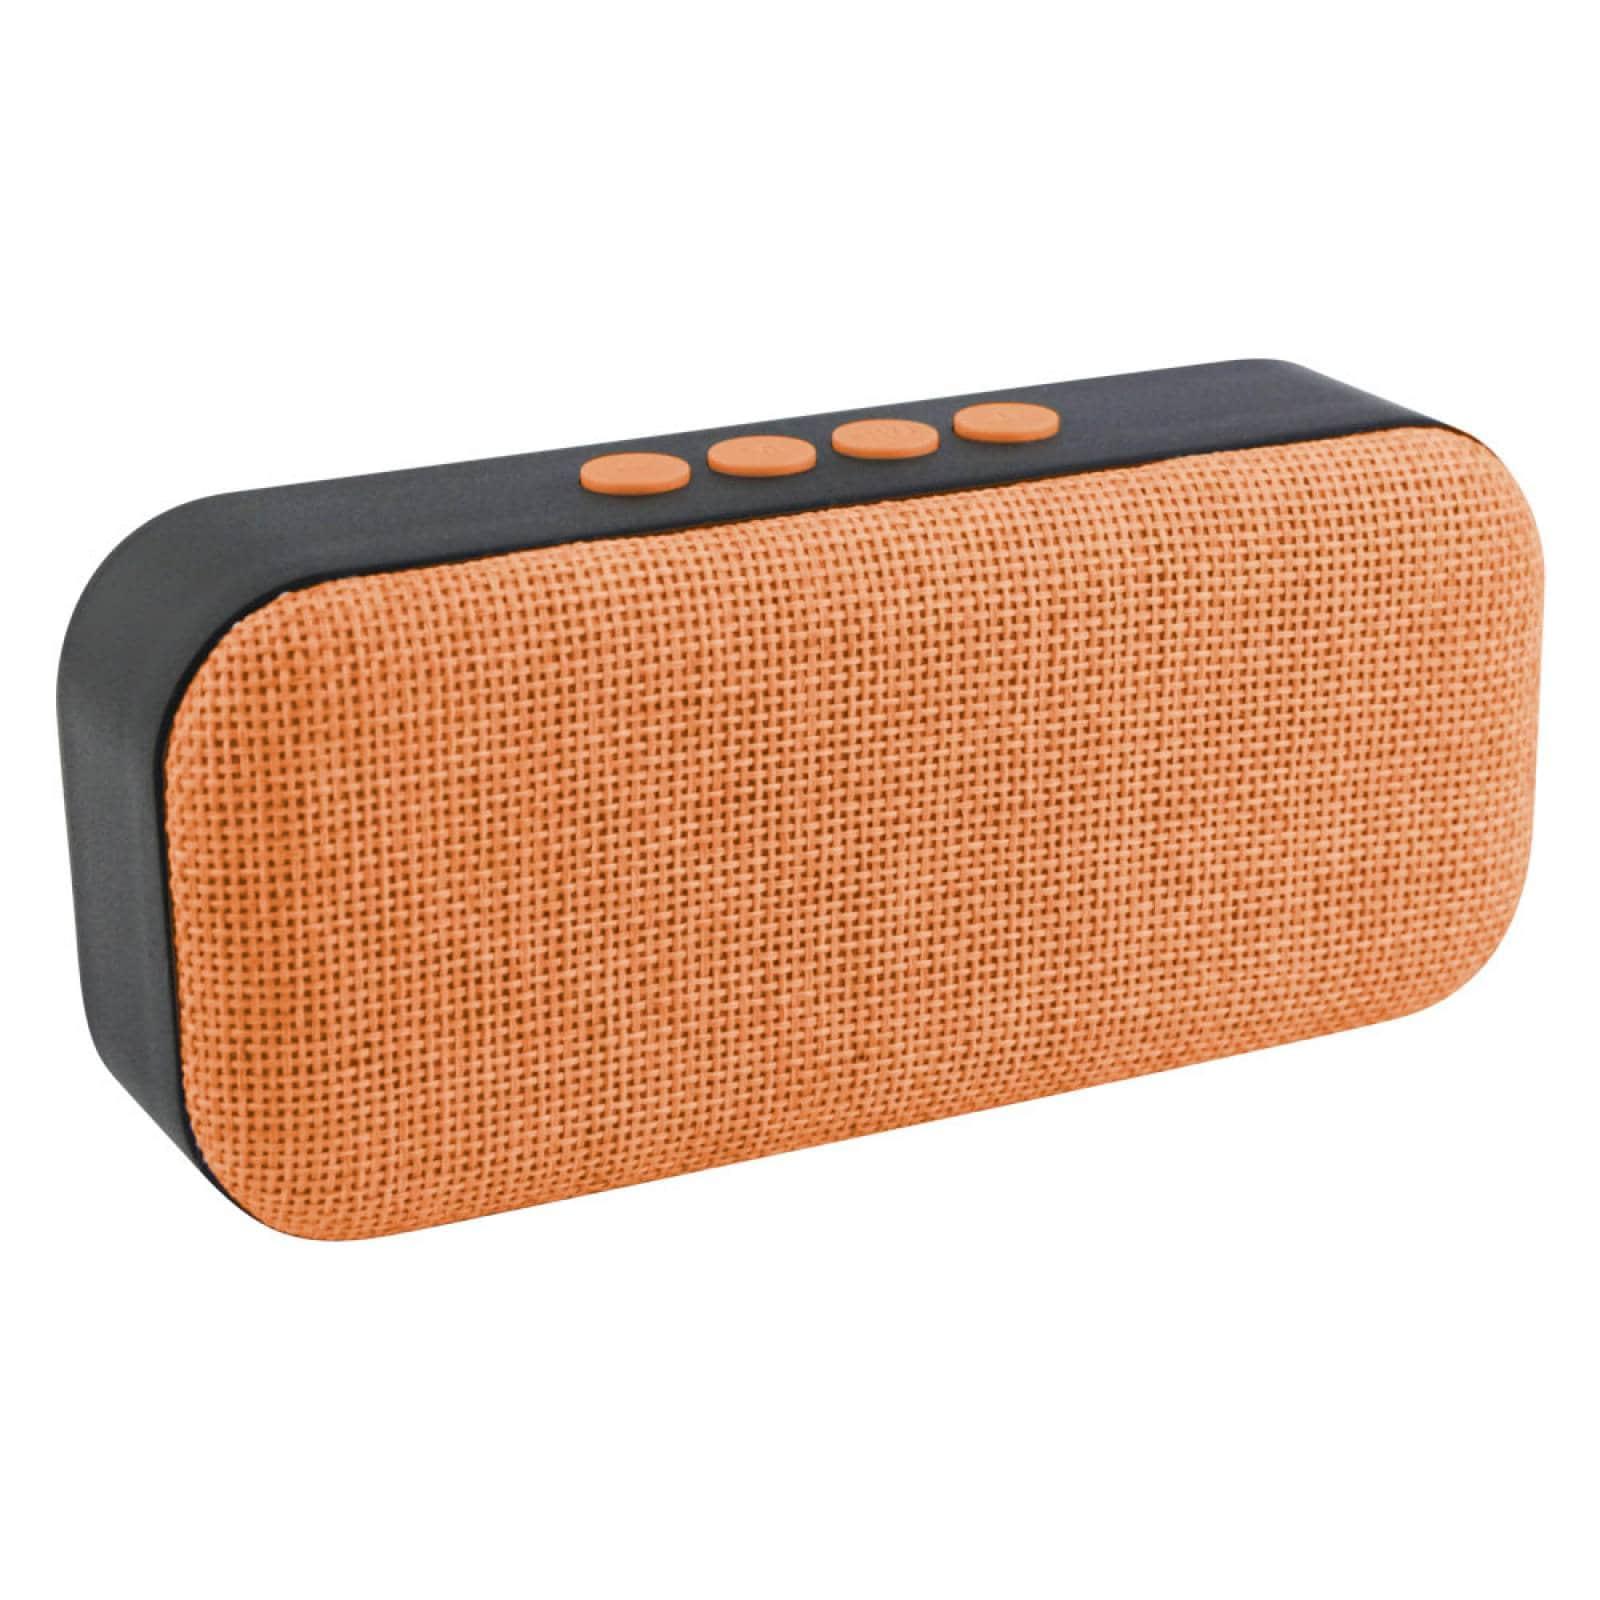 Bocina Portatil Bluetooth Plus Power 120w Pp-sbt101 Naranja